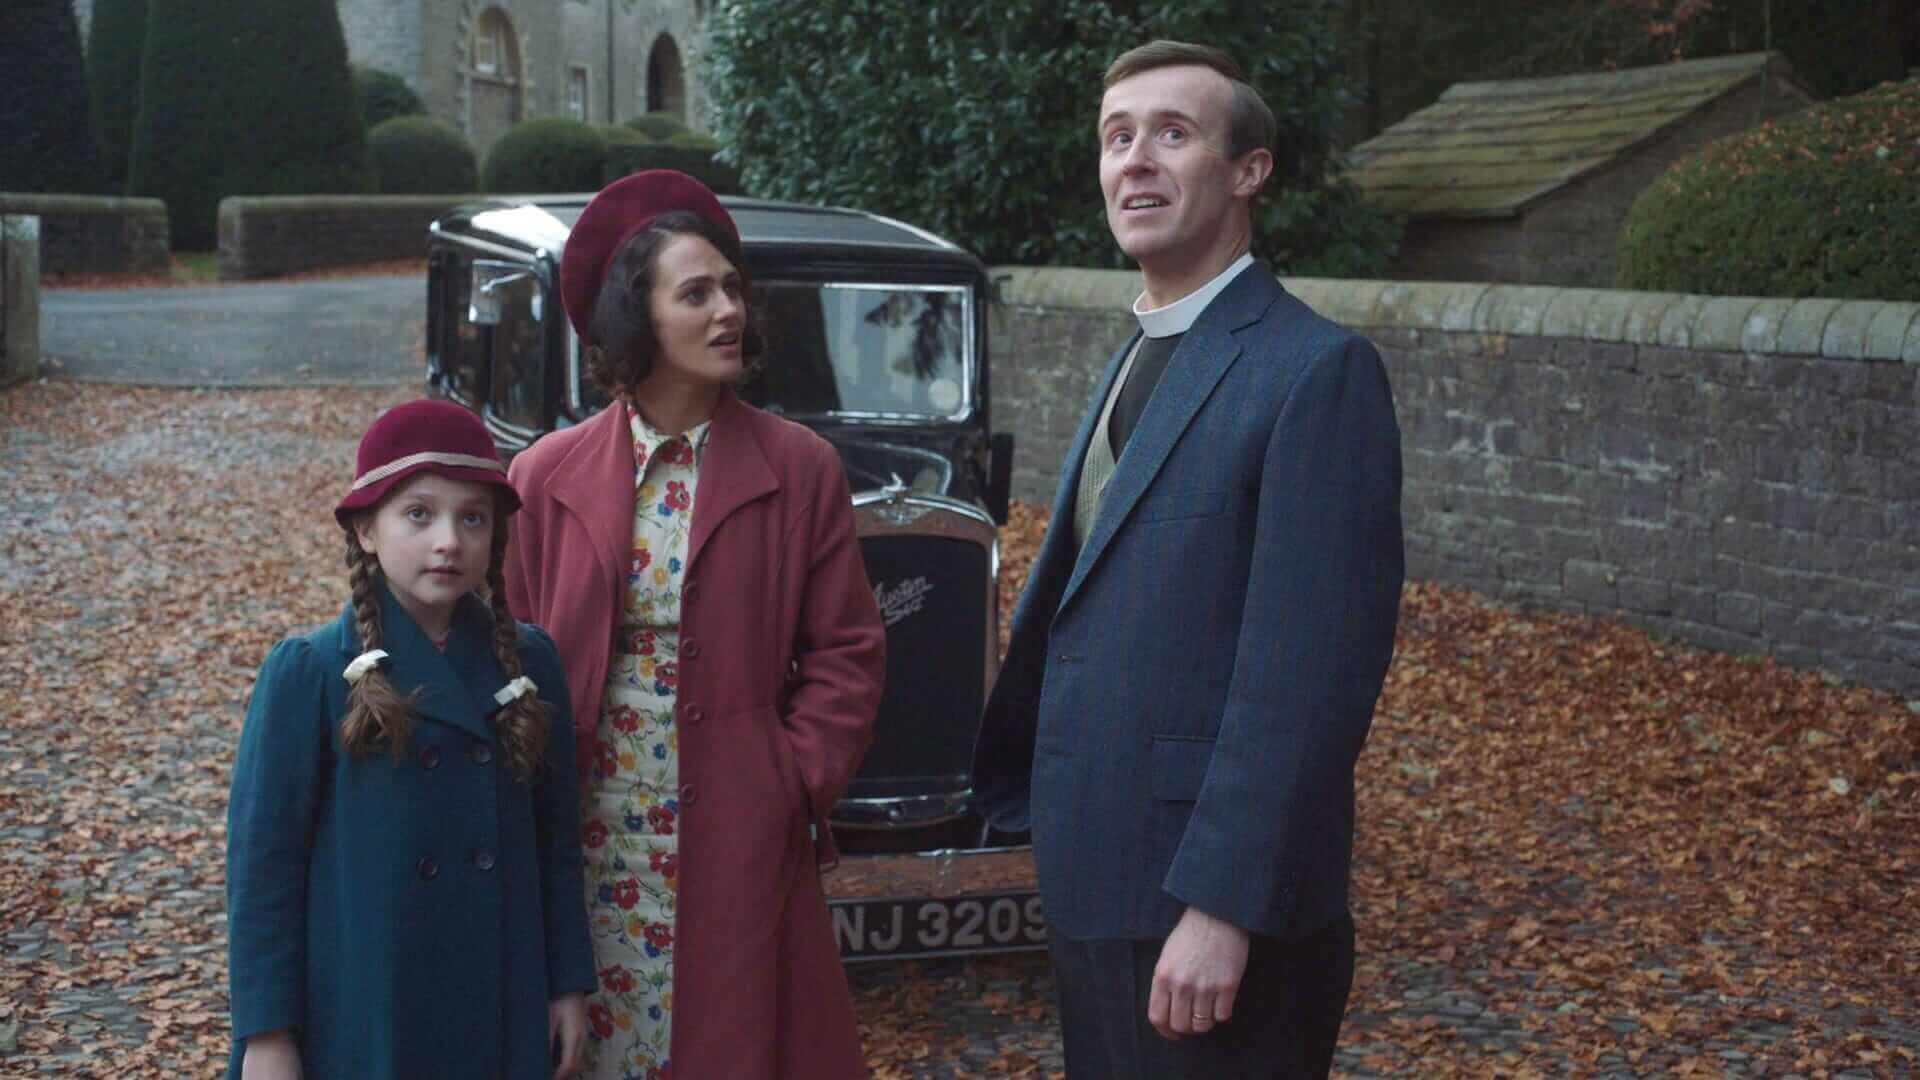 The Banishing Jessica Brown Findlay, John Heffernan, Anya McKenna-Bruce